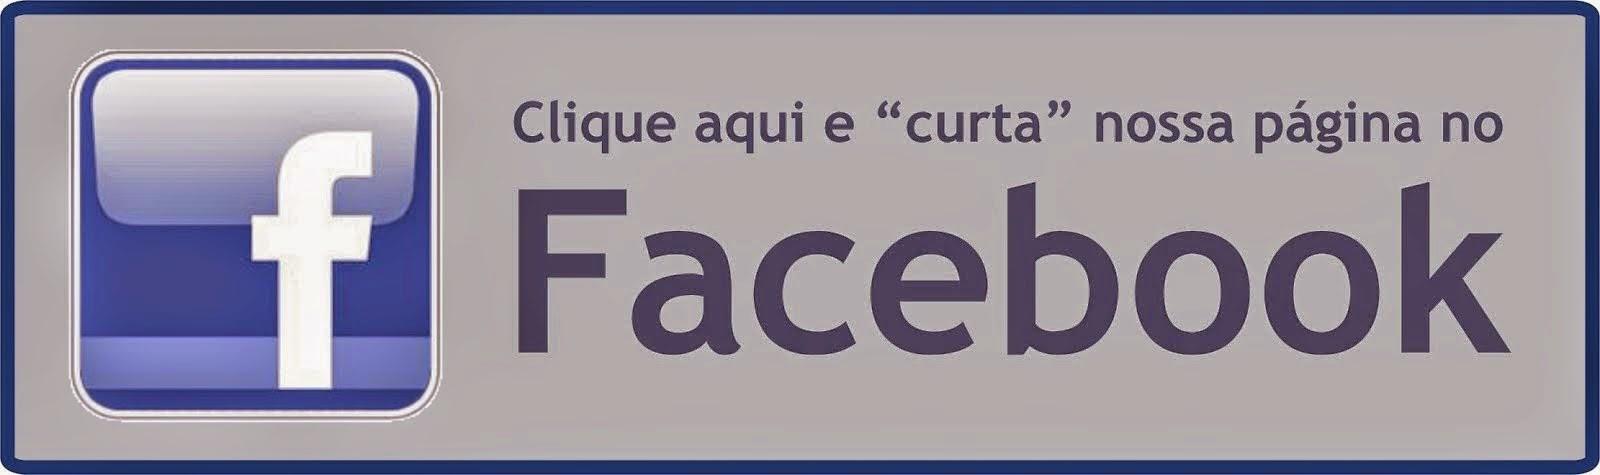 CURTA NOSSO FACE!